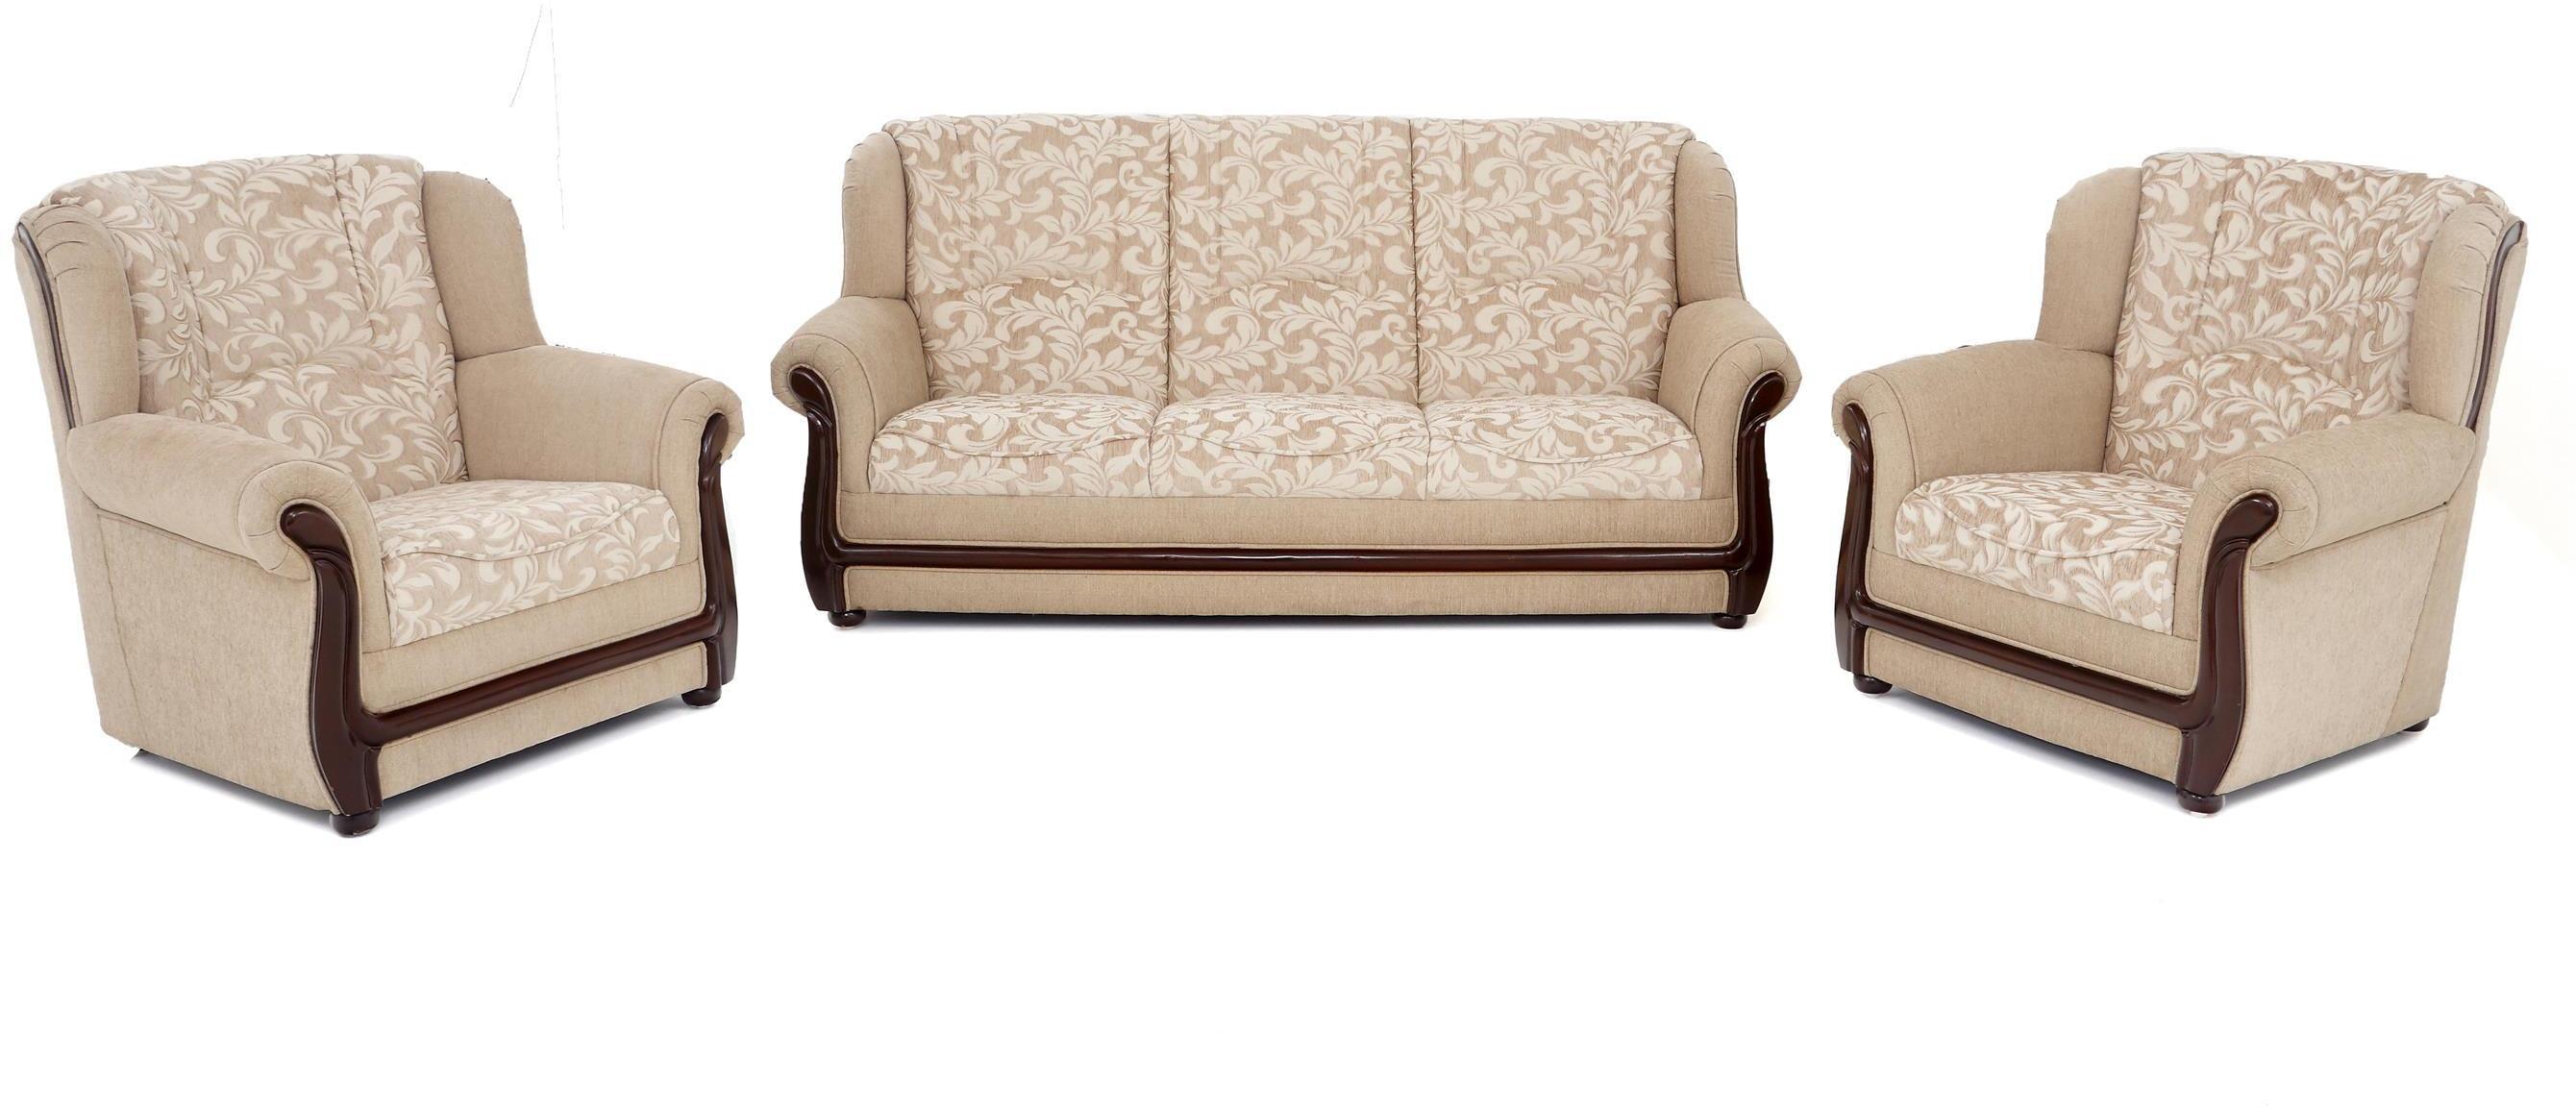 Phenomenal Furnicity Solid Wood 3 1 1 Beige Sofa Set Furniture Download Free Architecture Designs Itiscsunscenecom